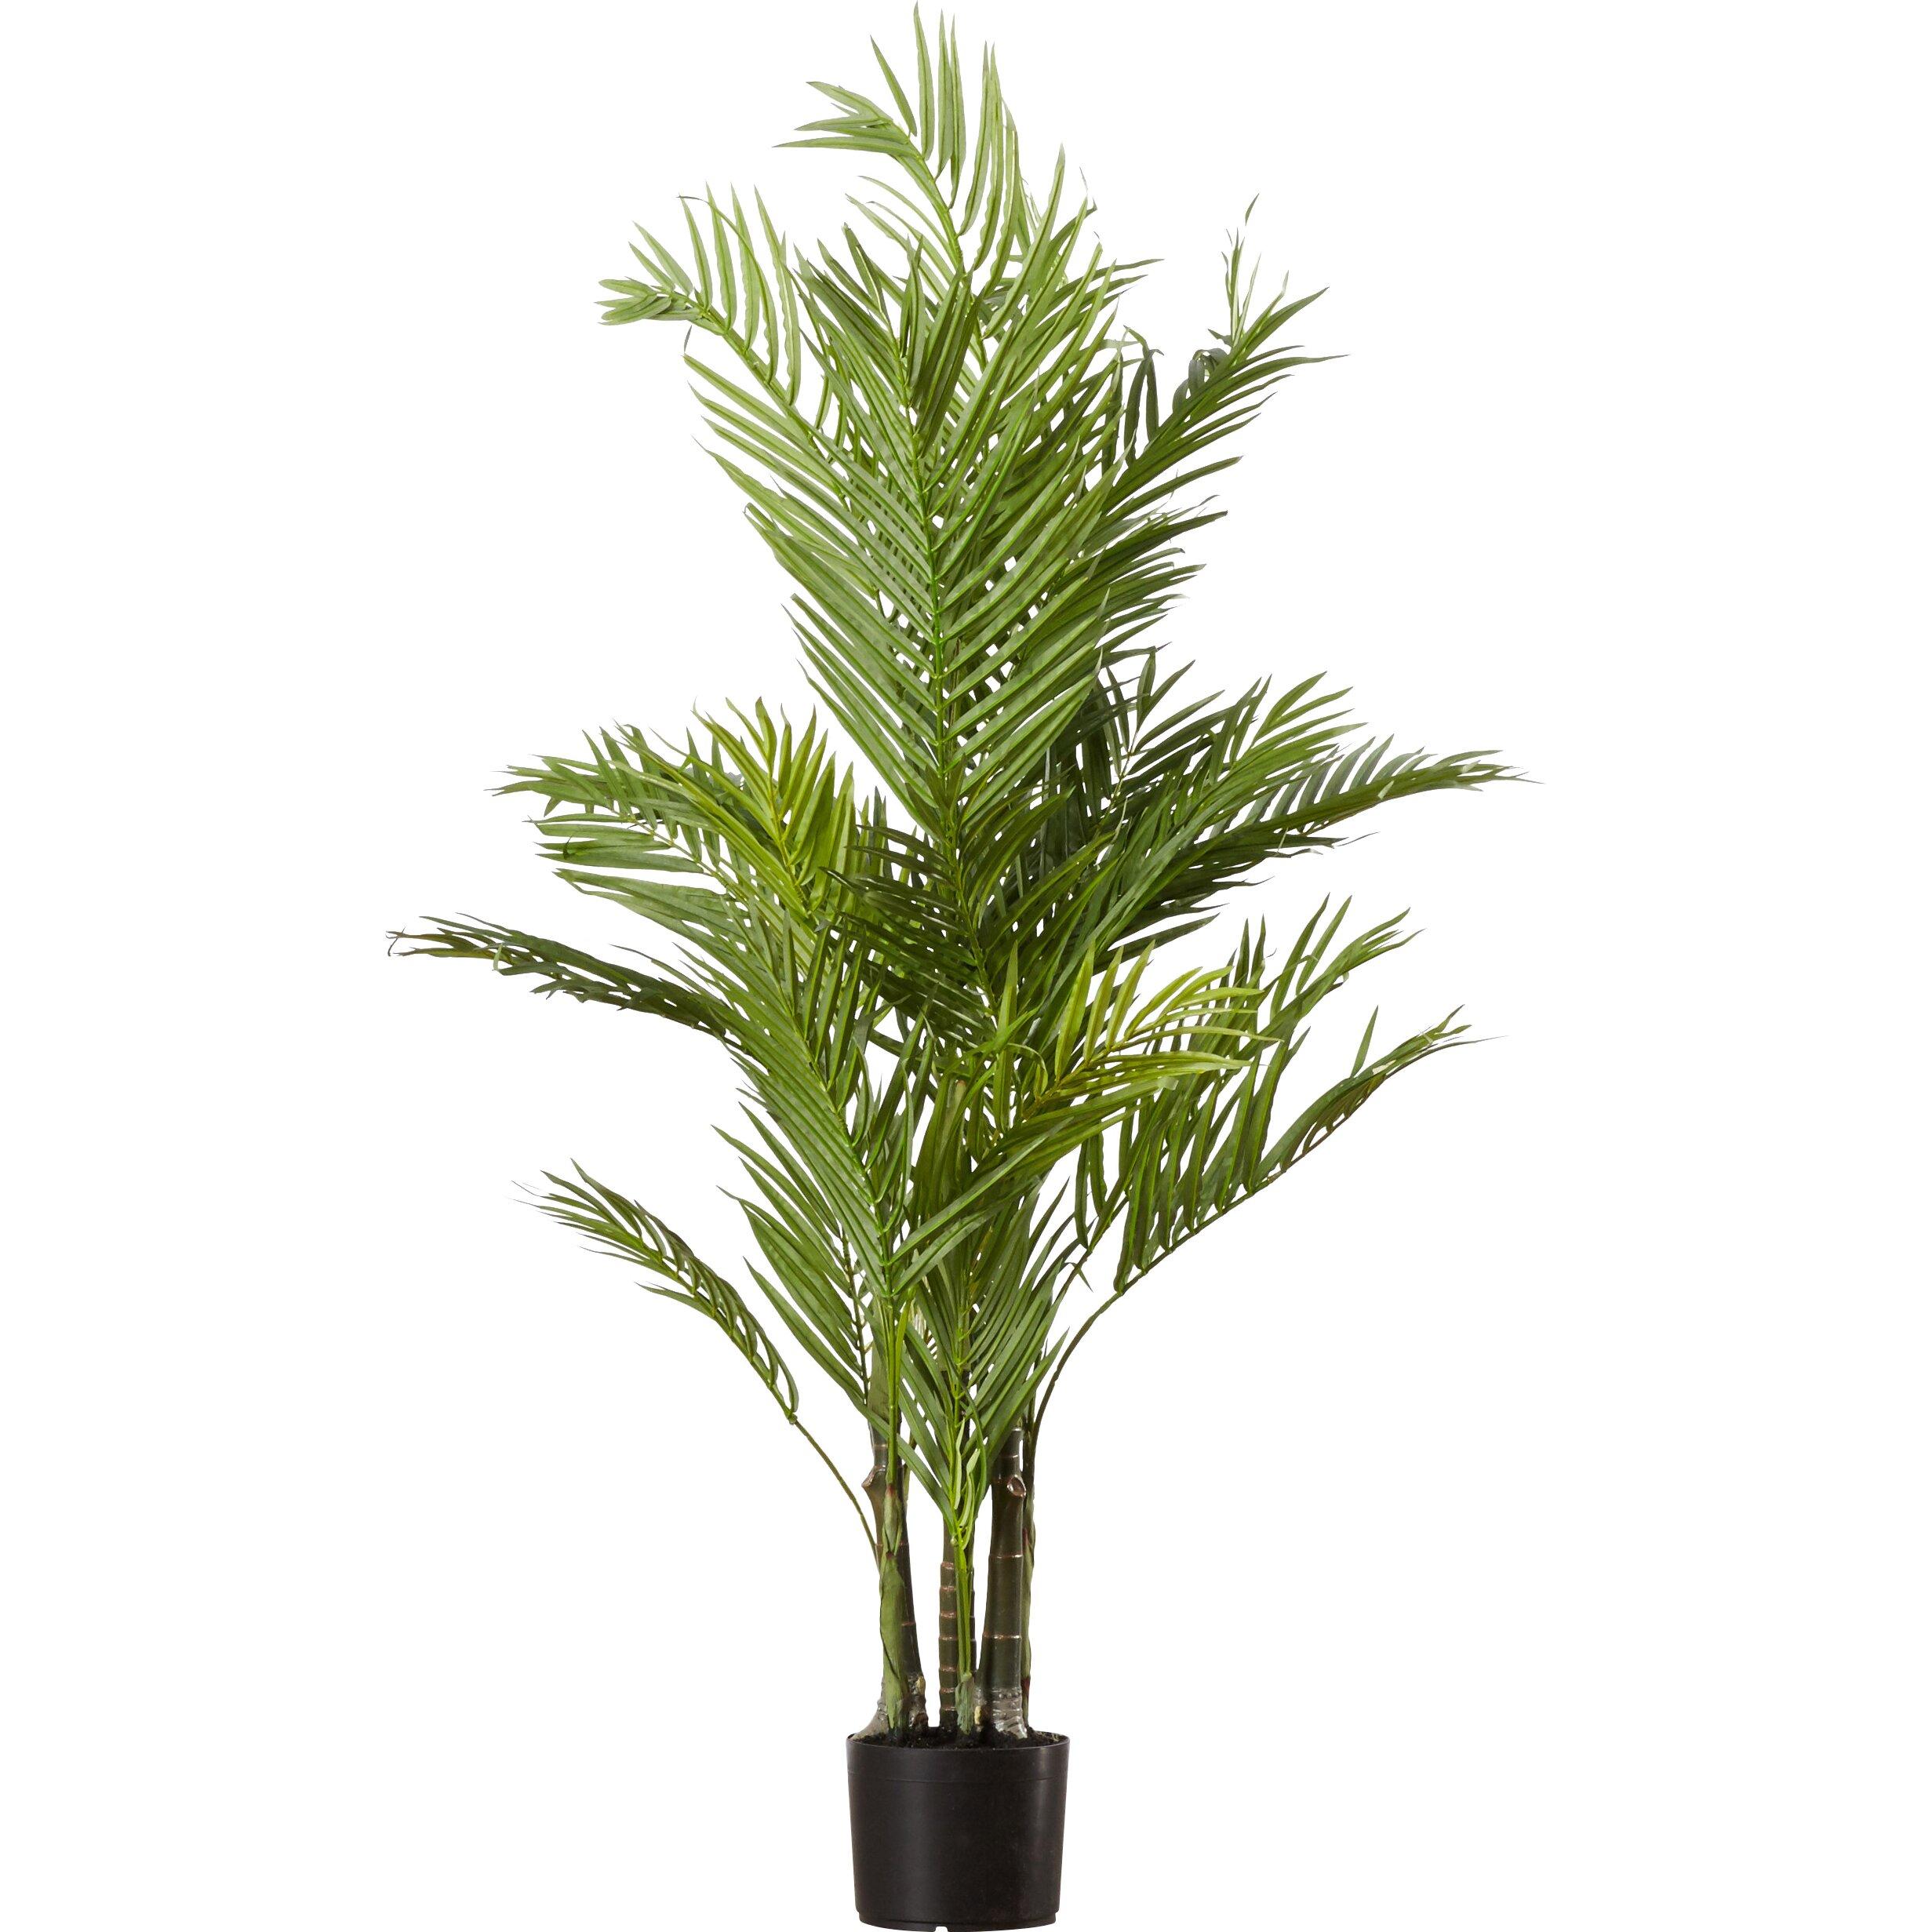 Beachcrest Home Brookings Silk Areca Palm Tree In Pot